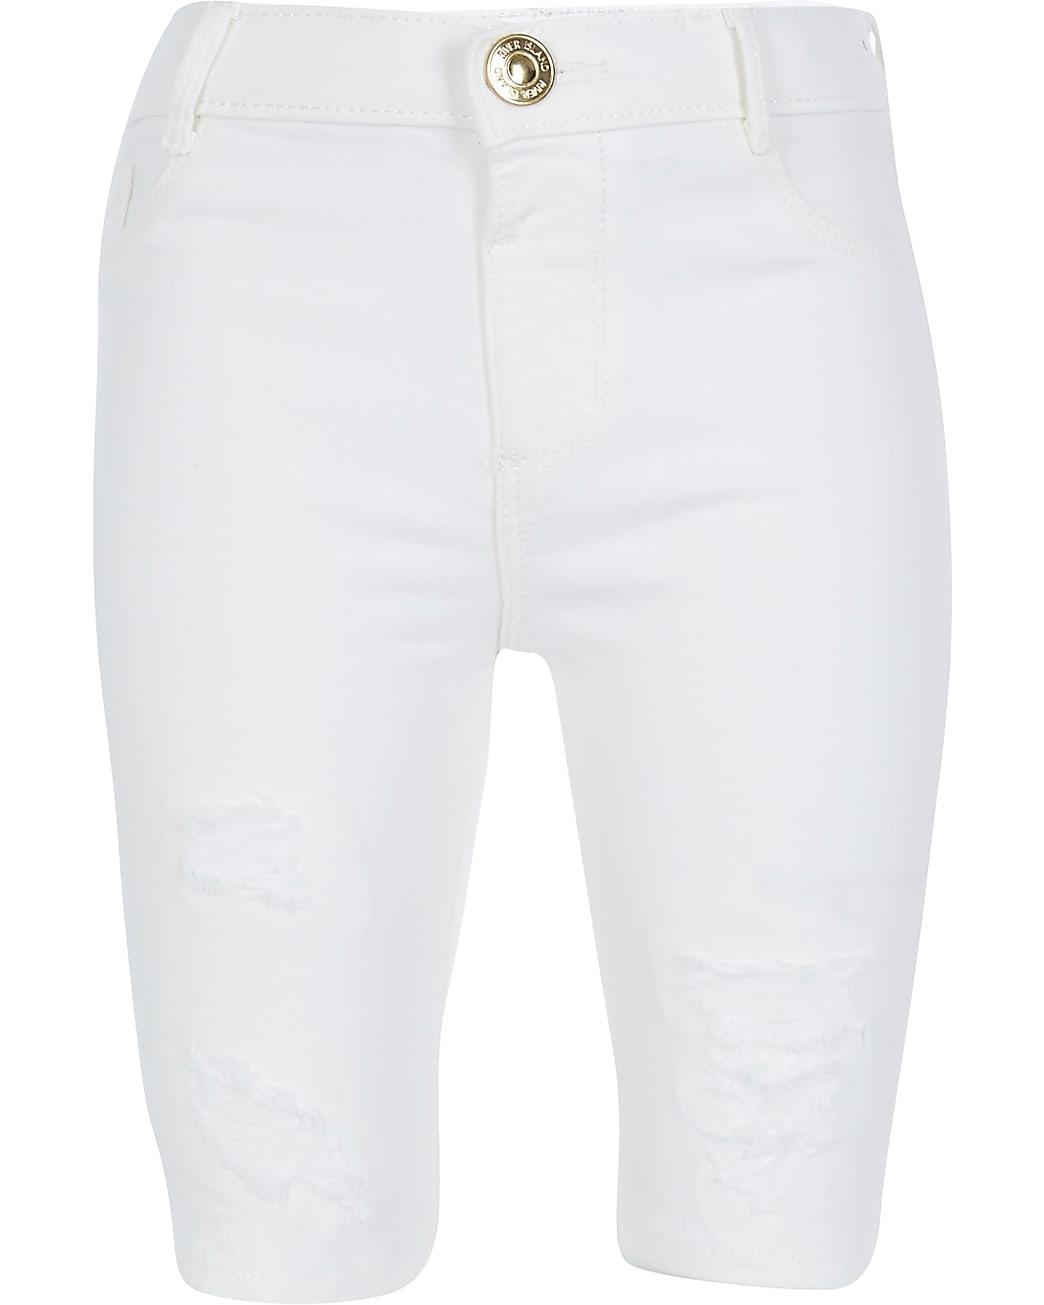 Girls white ripped denim cycling short